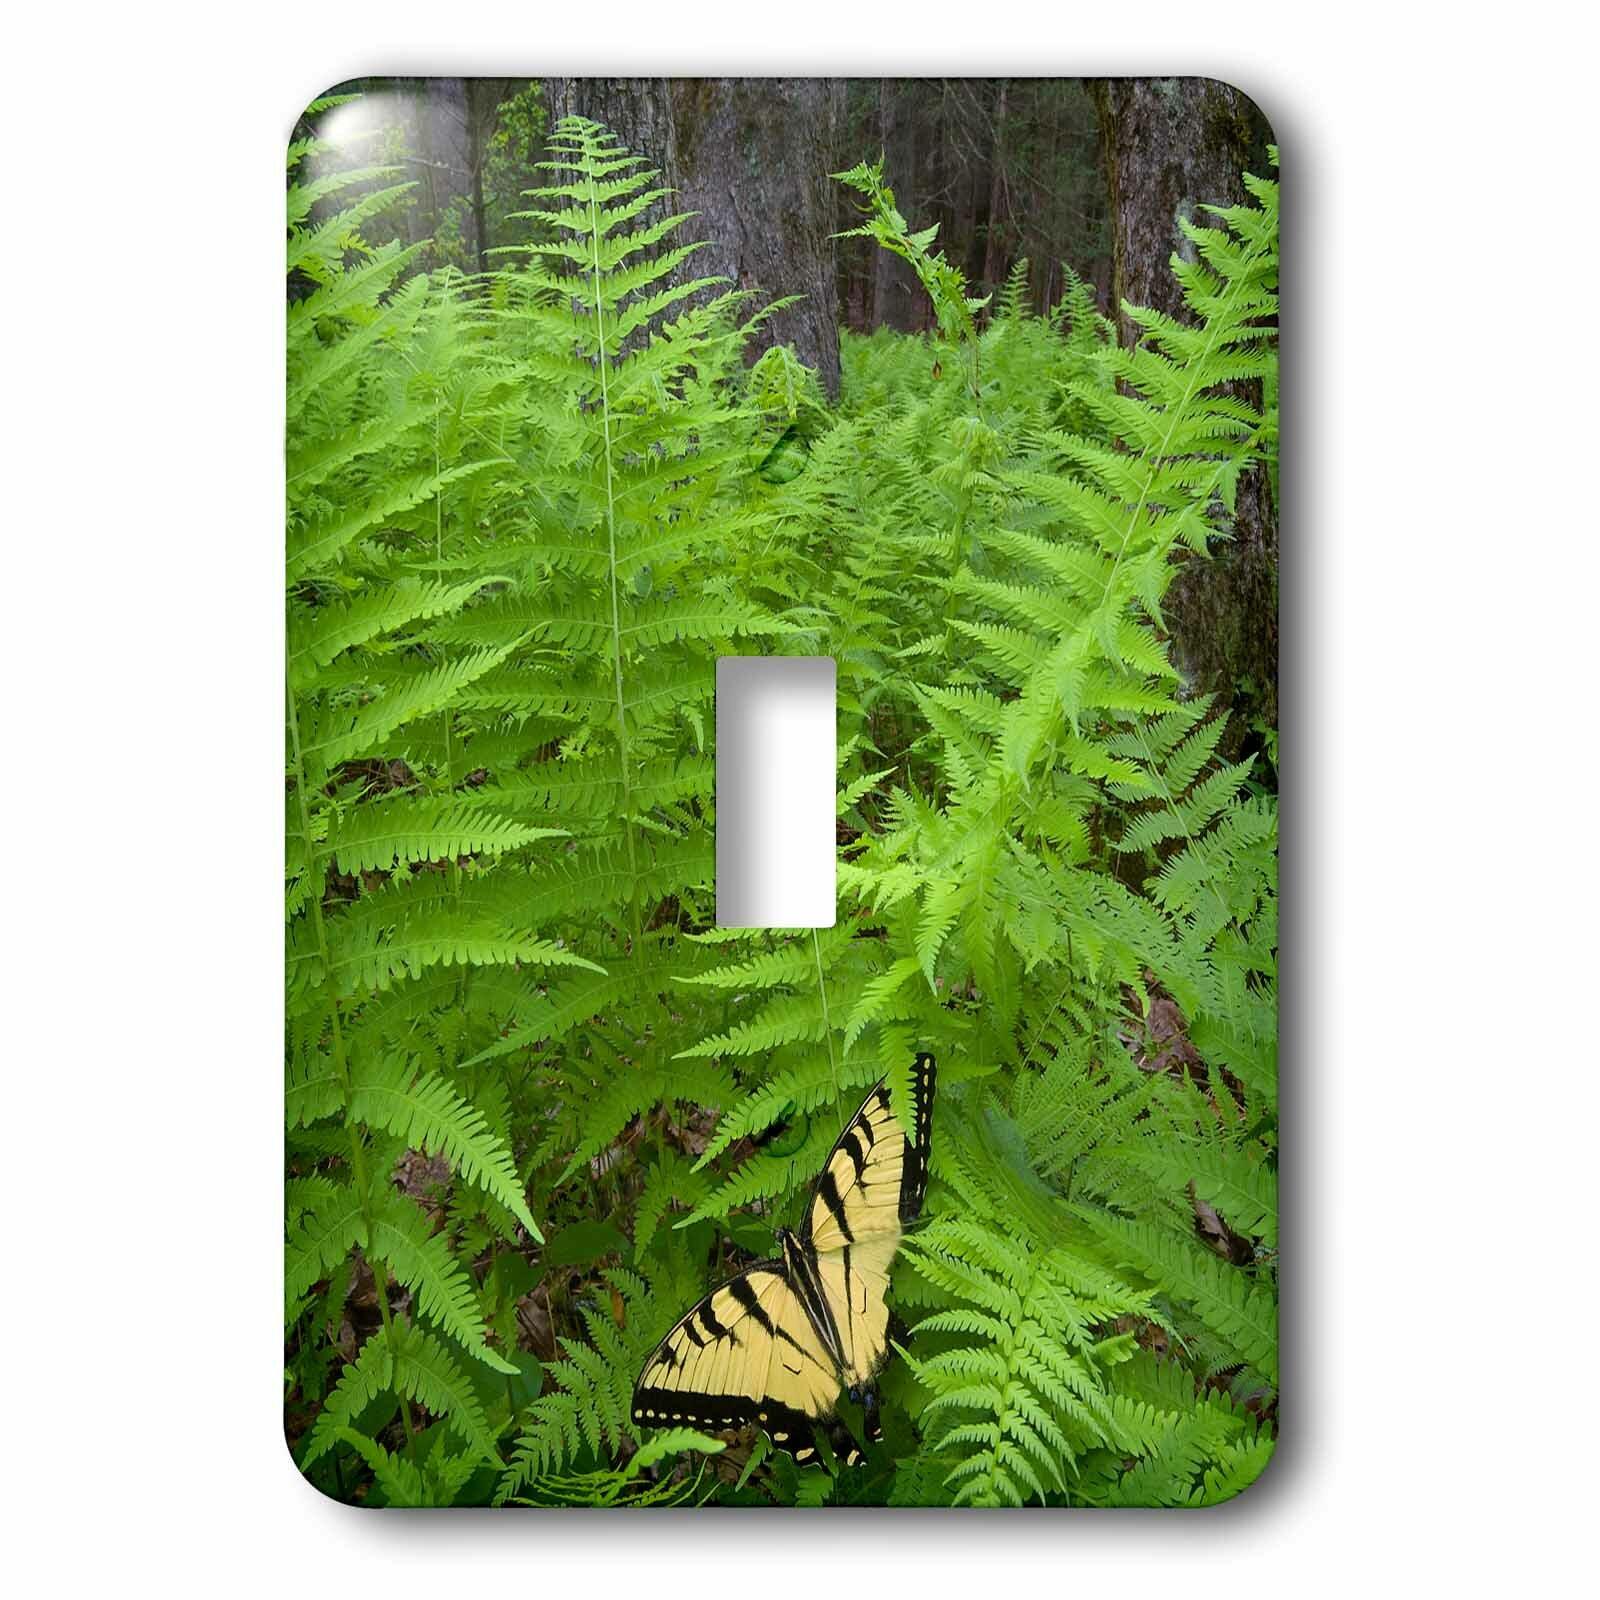 3drose Swallowtail Butterfly On Fern 1 Gang Toggle Light Switch Wall Plate Wayfair